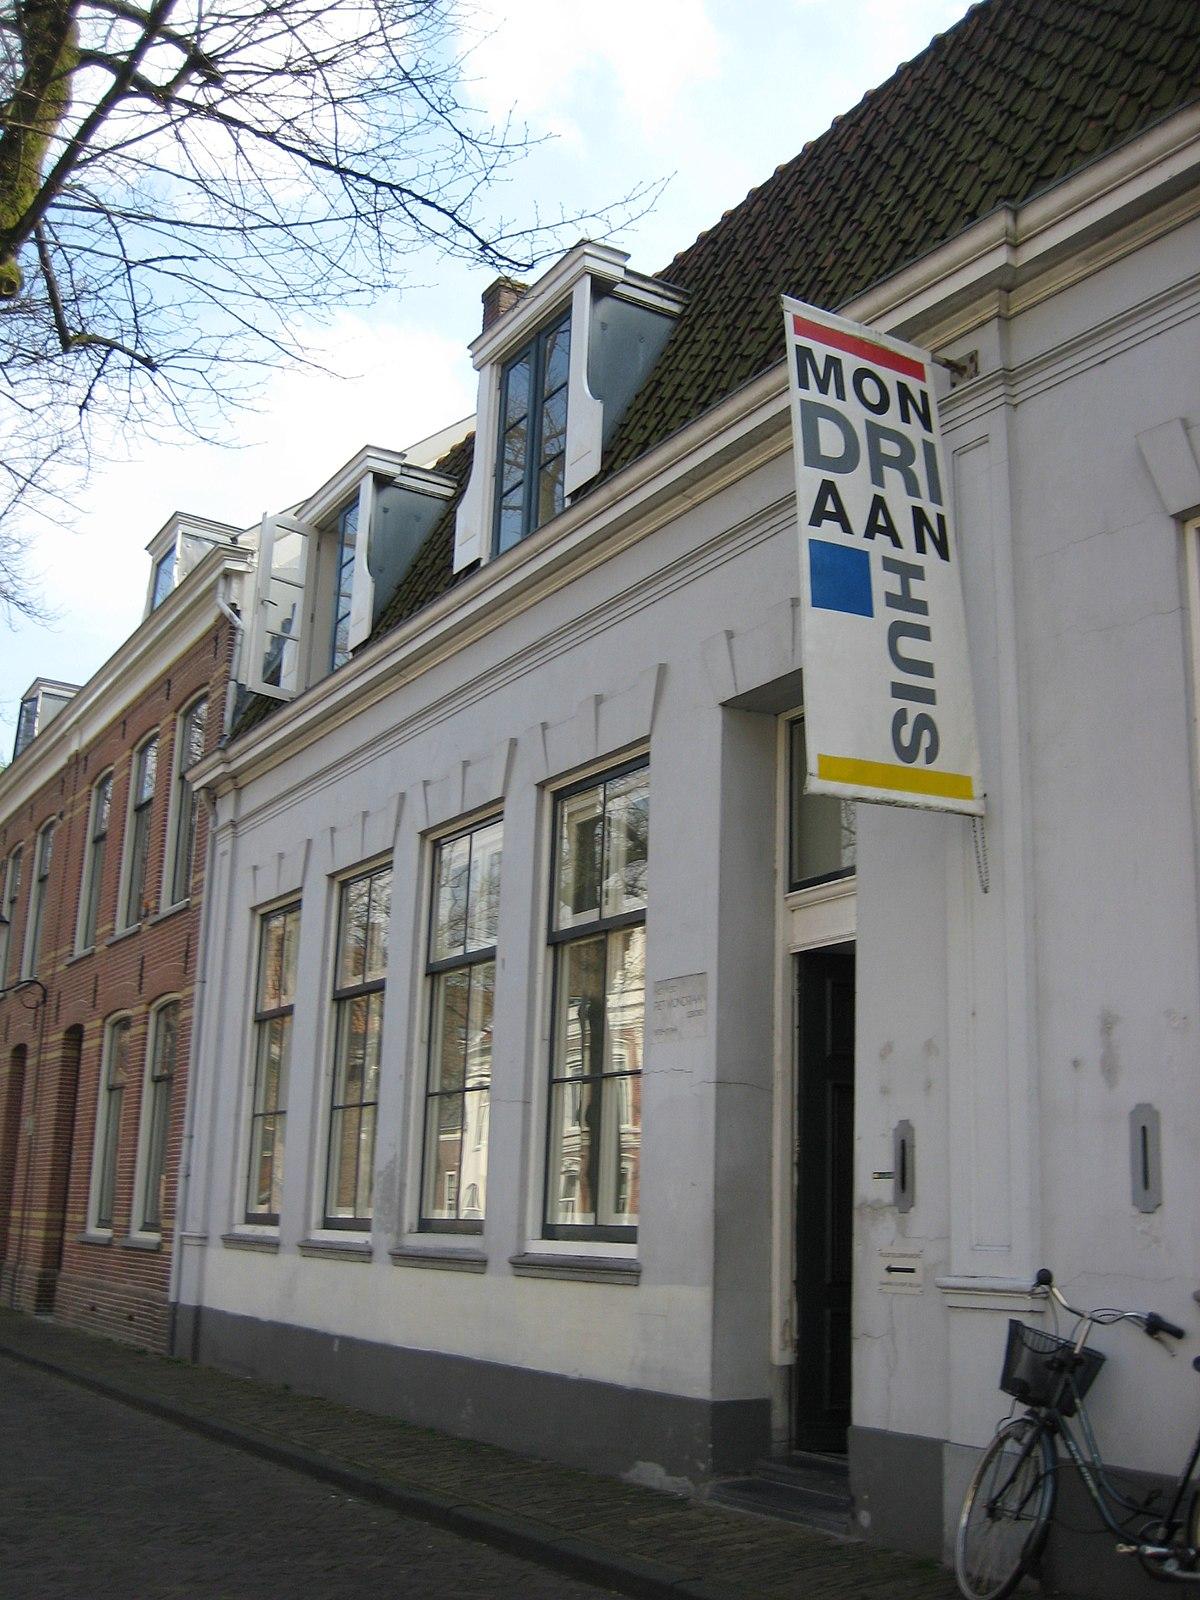 The Mondriaan House  Wikipedia